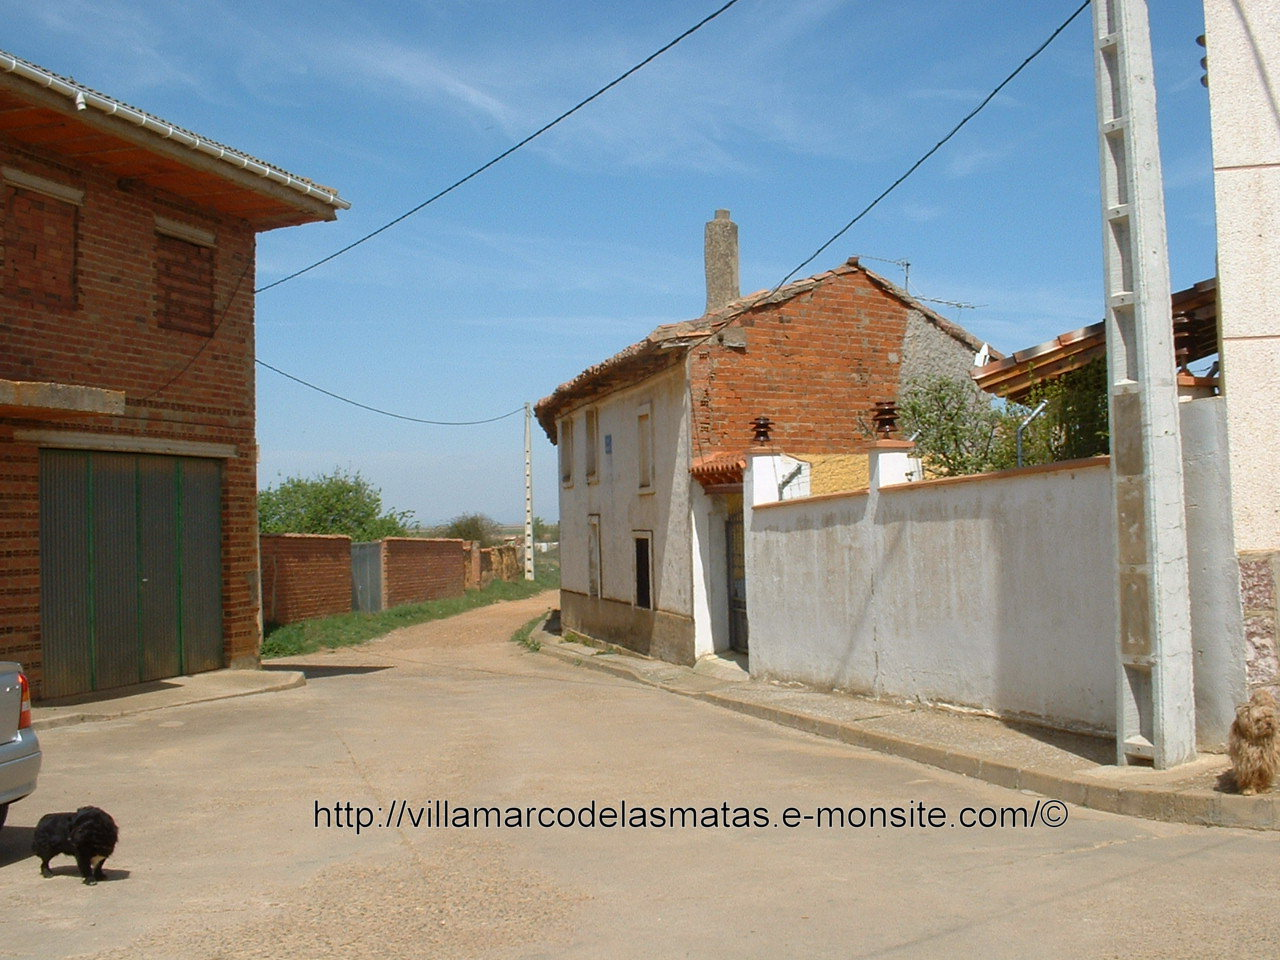 Calle Escarbajosa